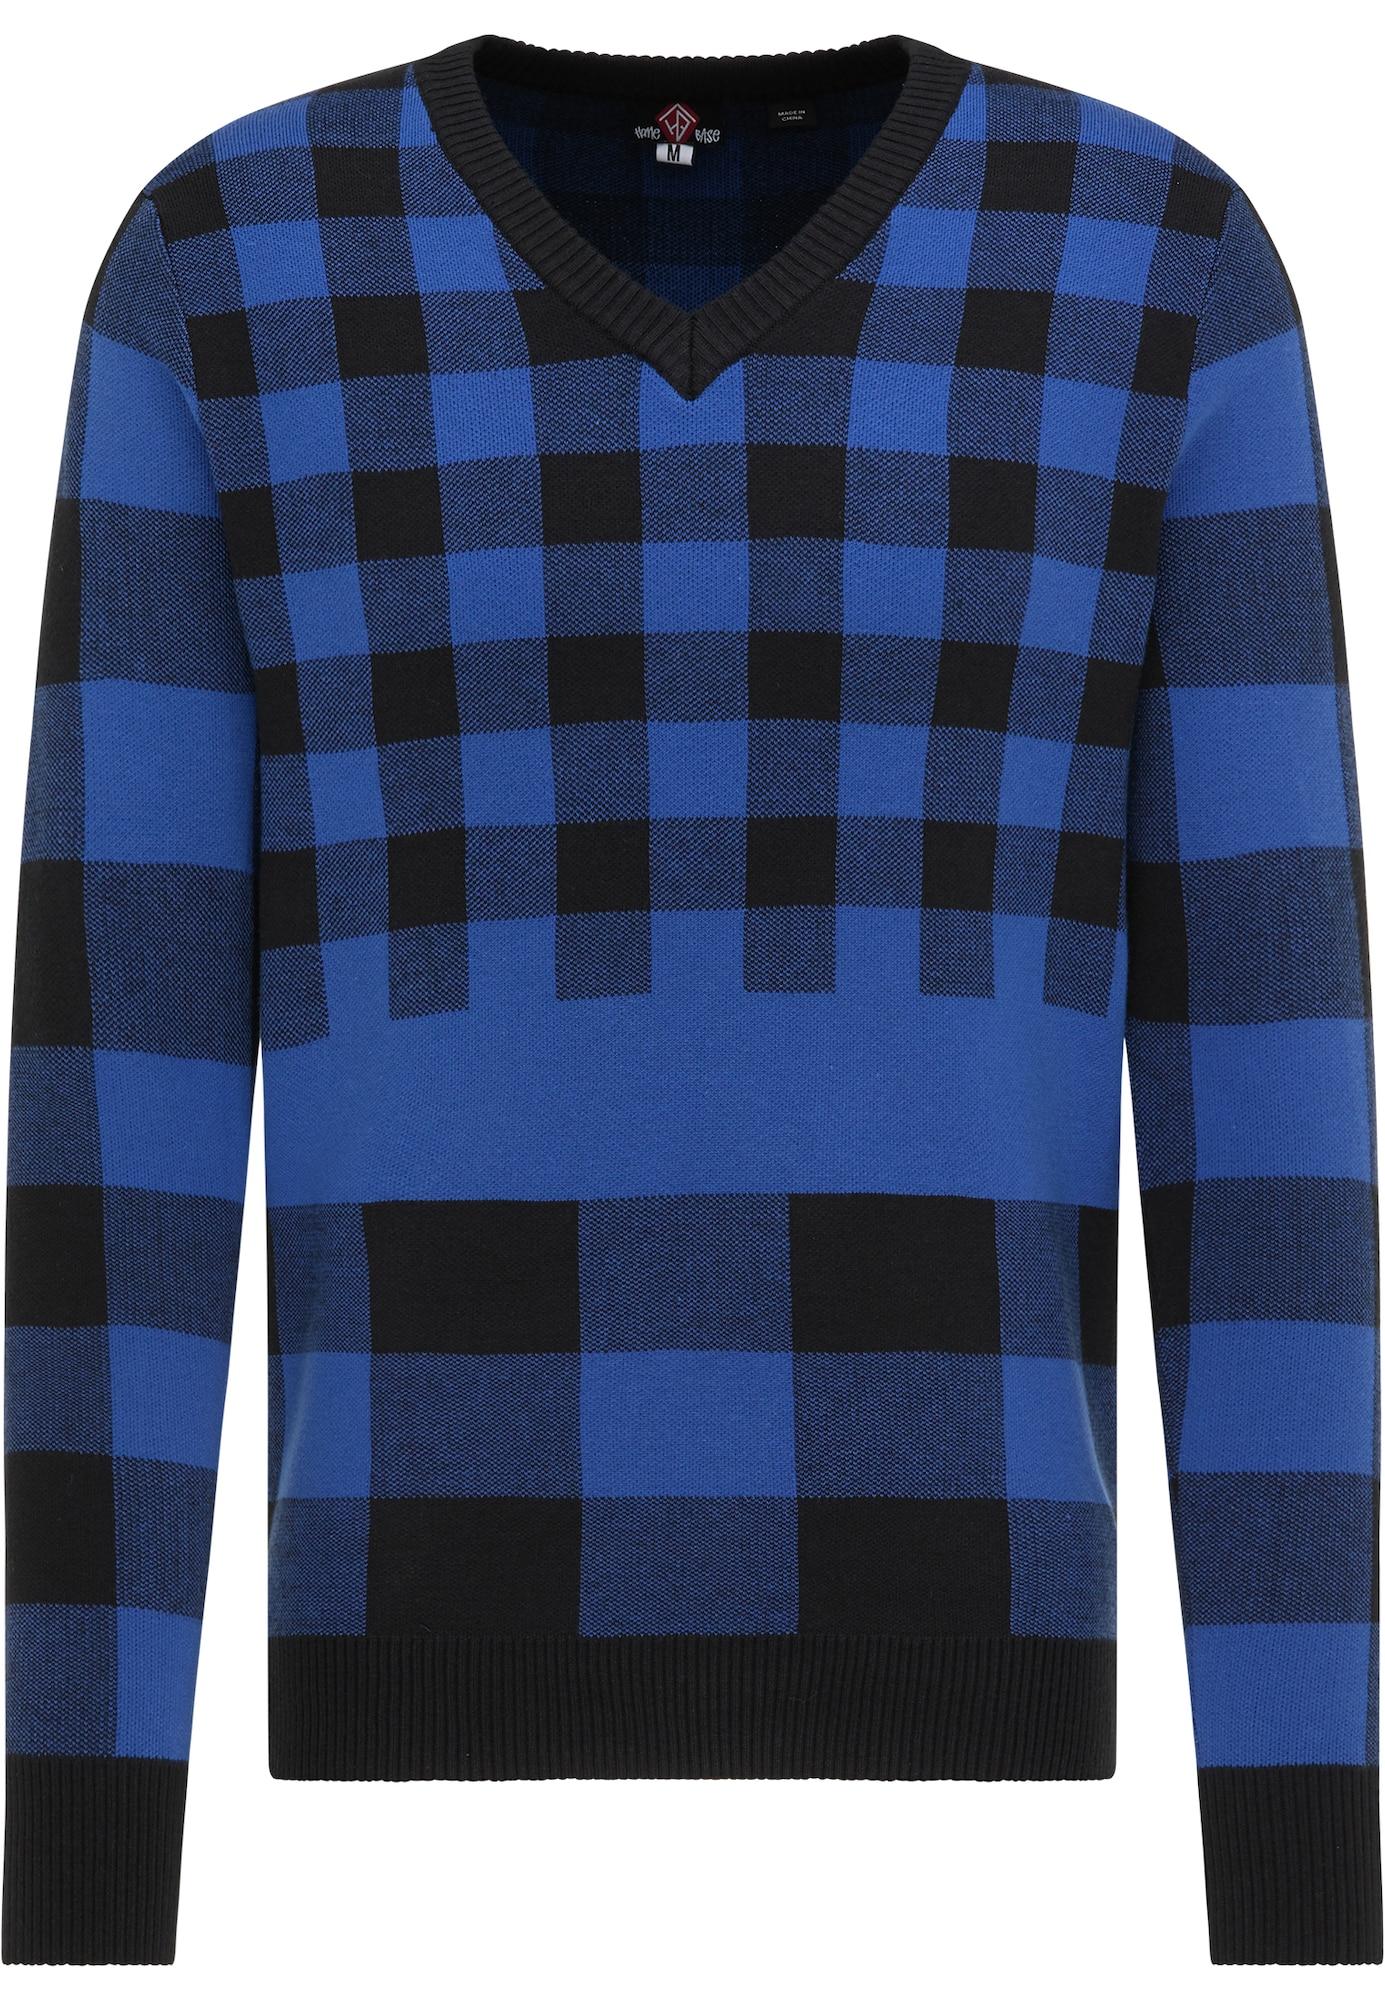 HOMEBASE Megztinis mėlyna / juoda